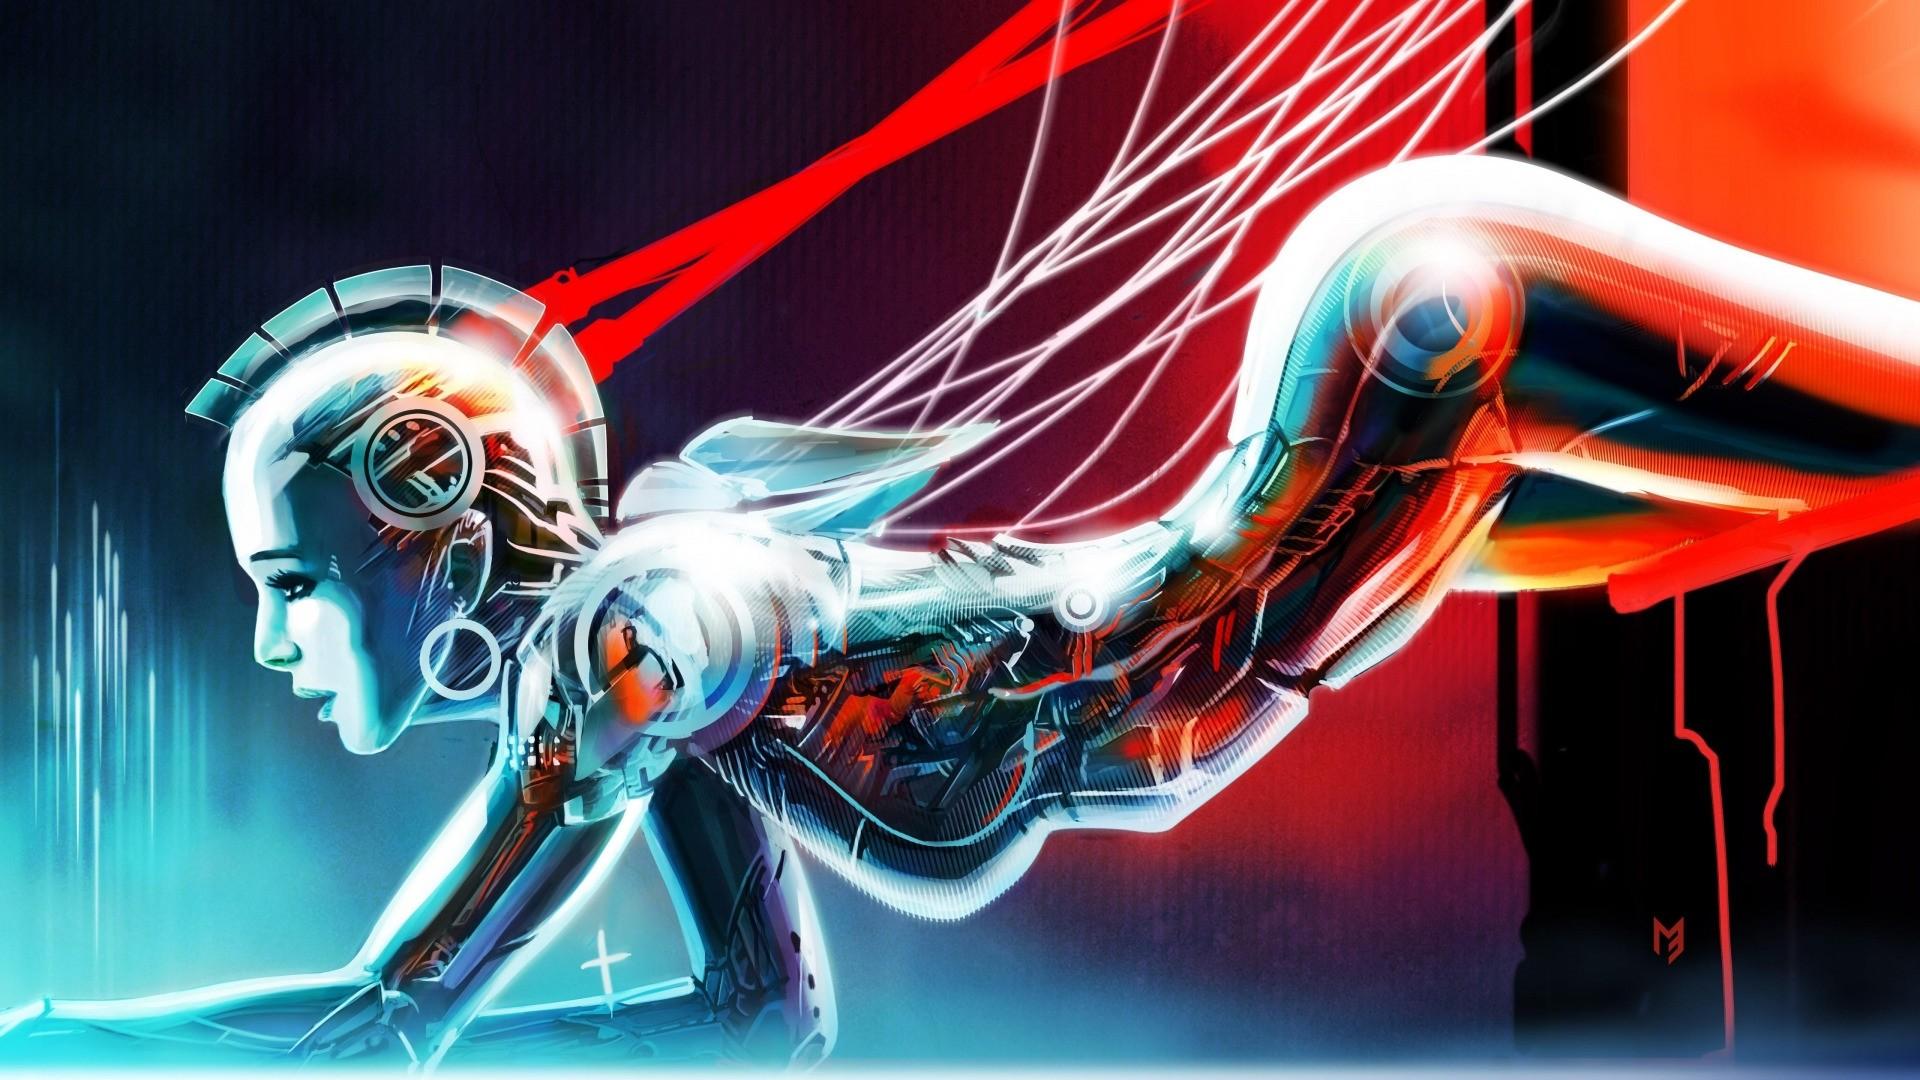 Robot HD Download